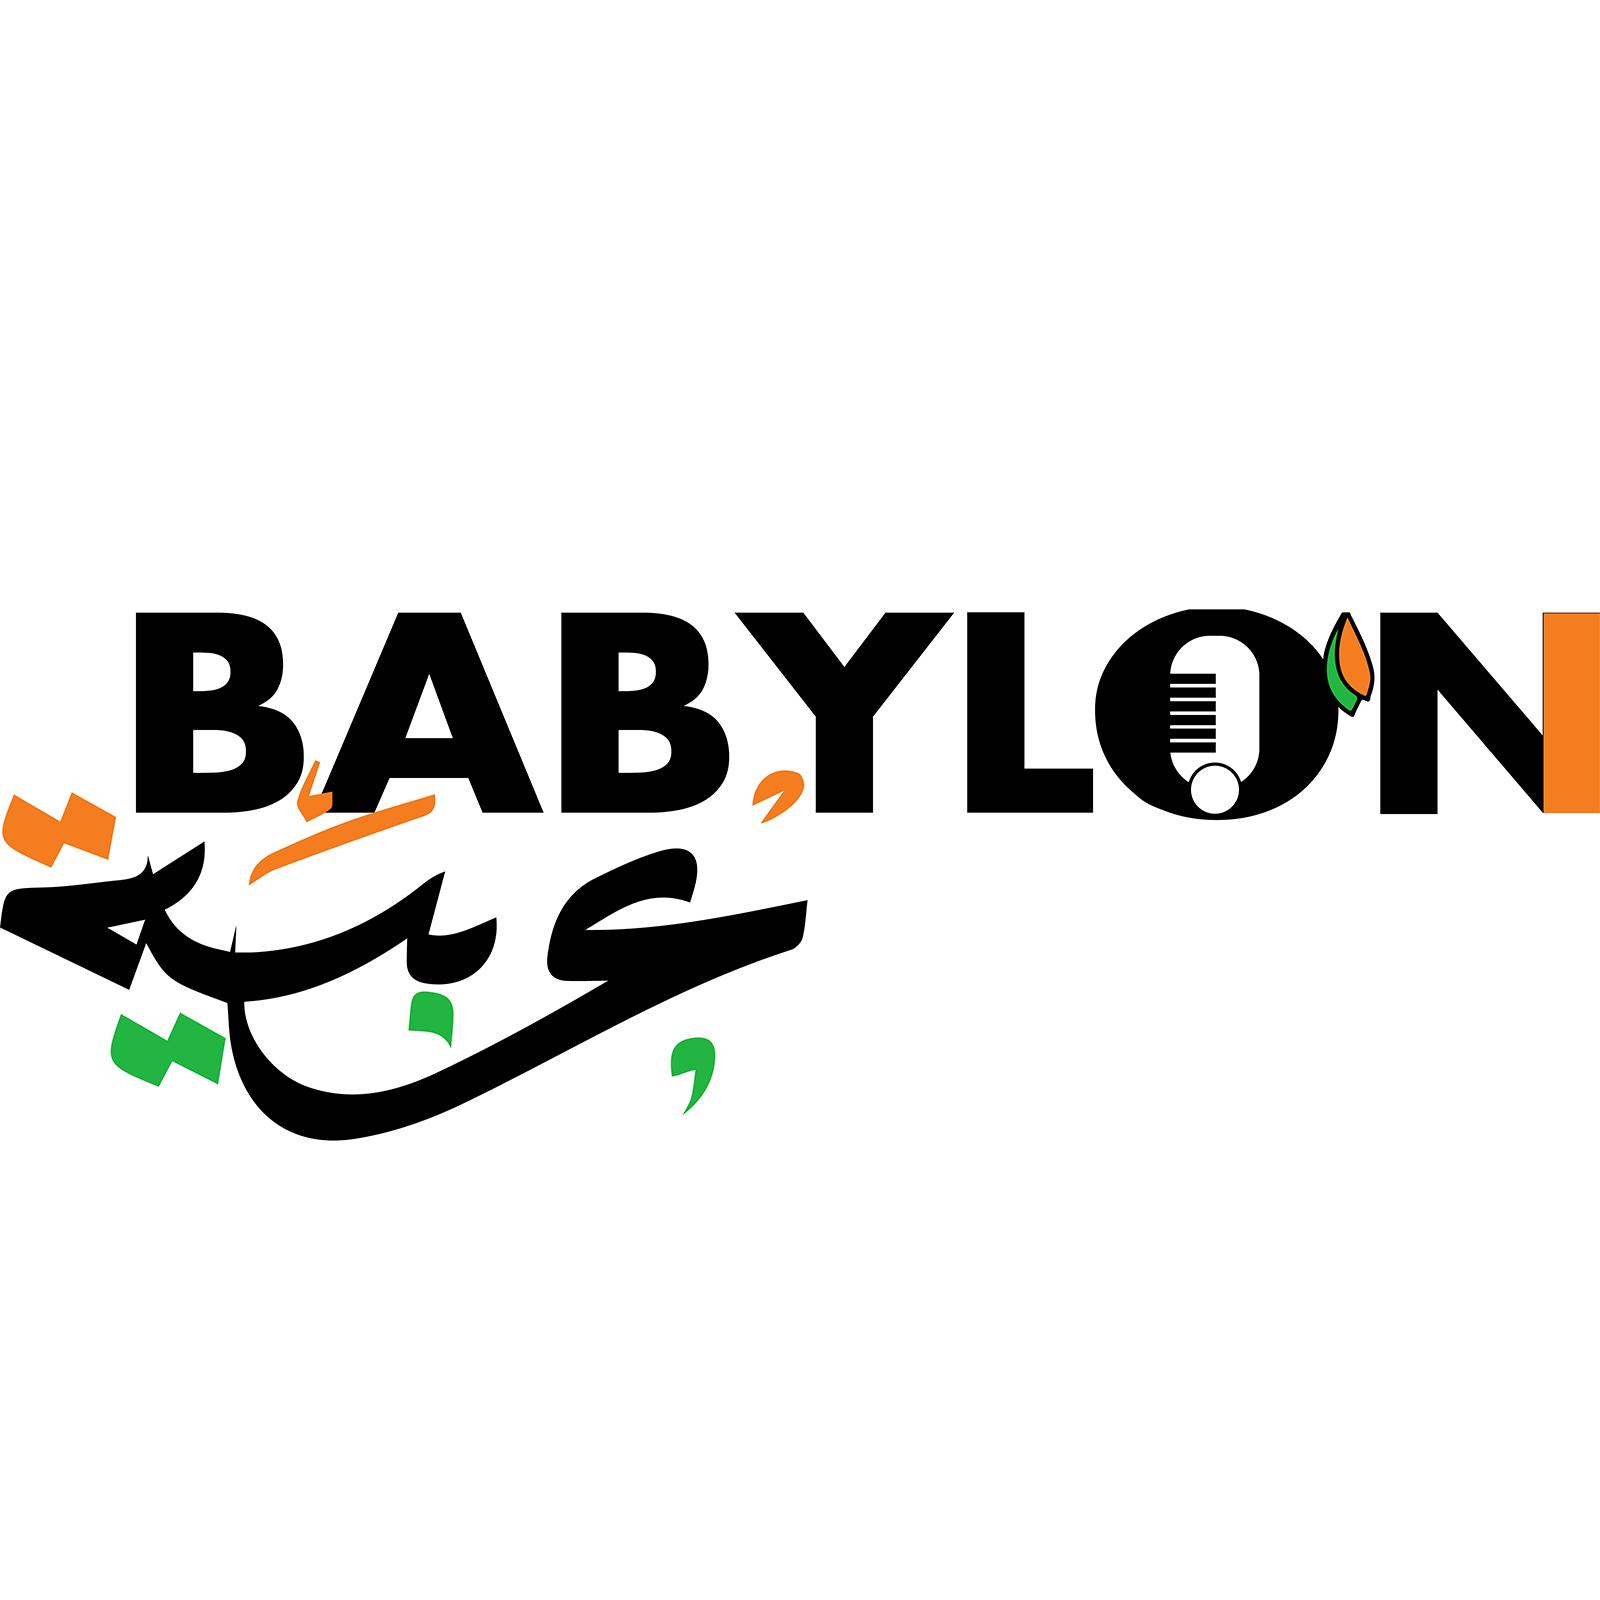 Babylon Arabia